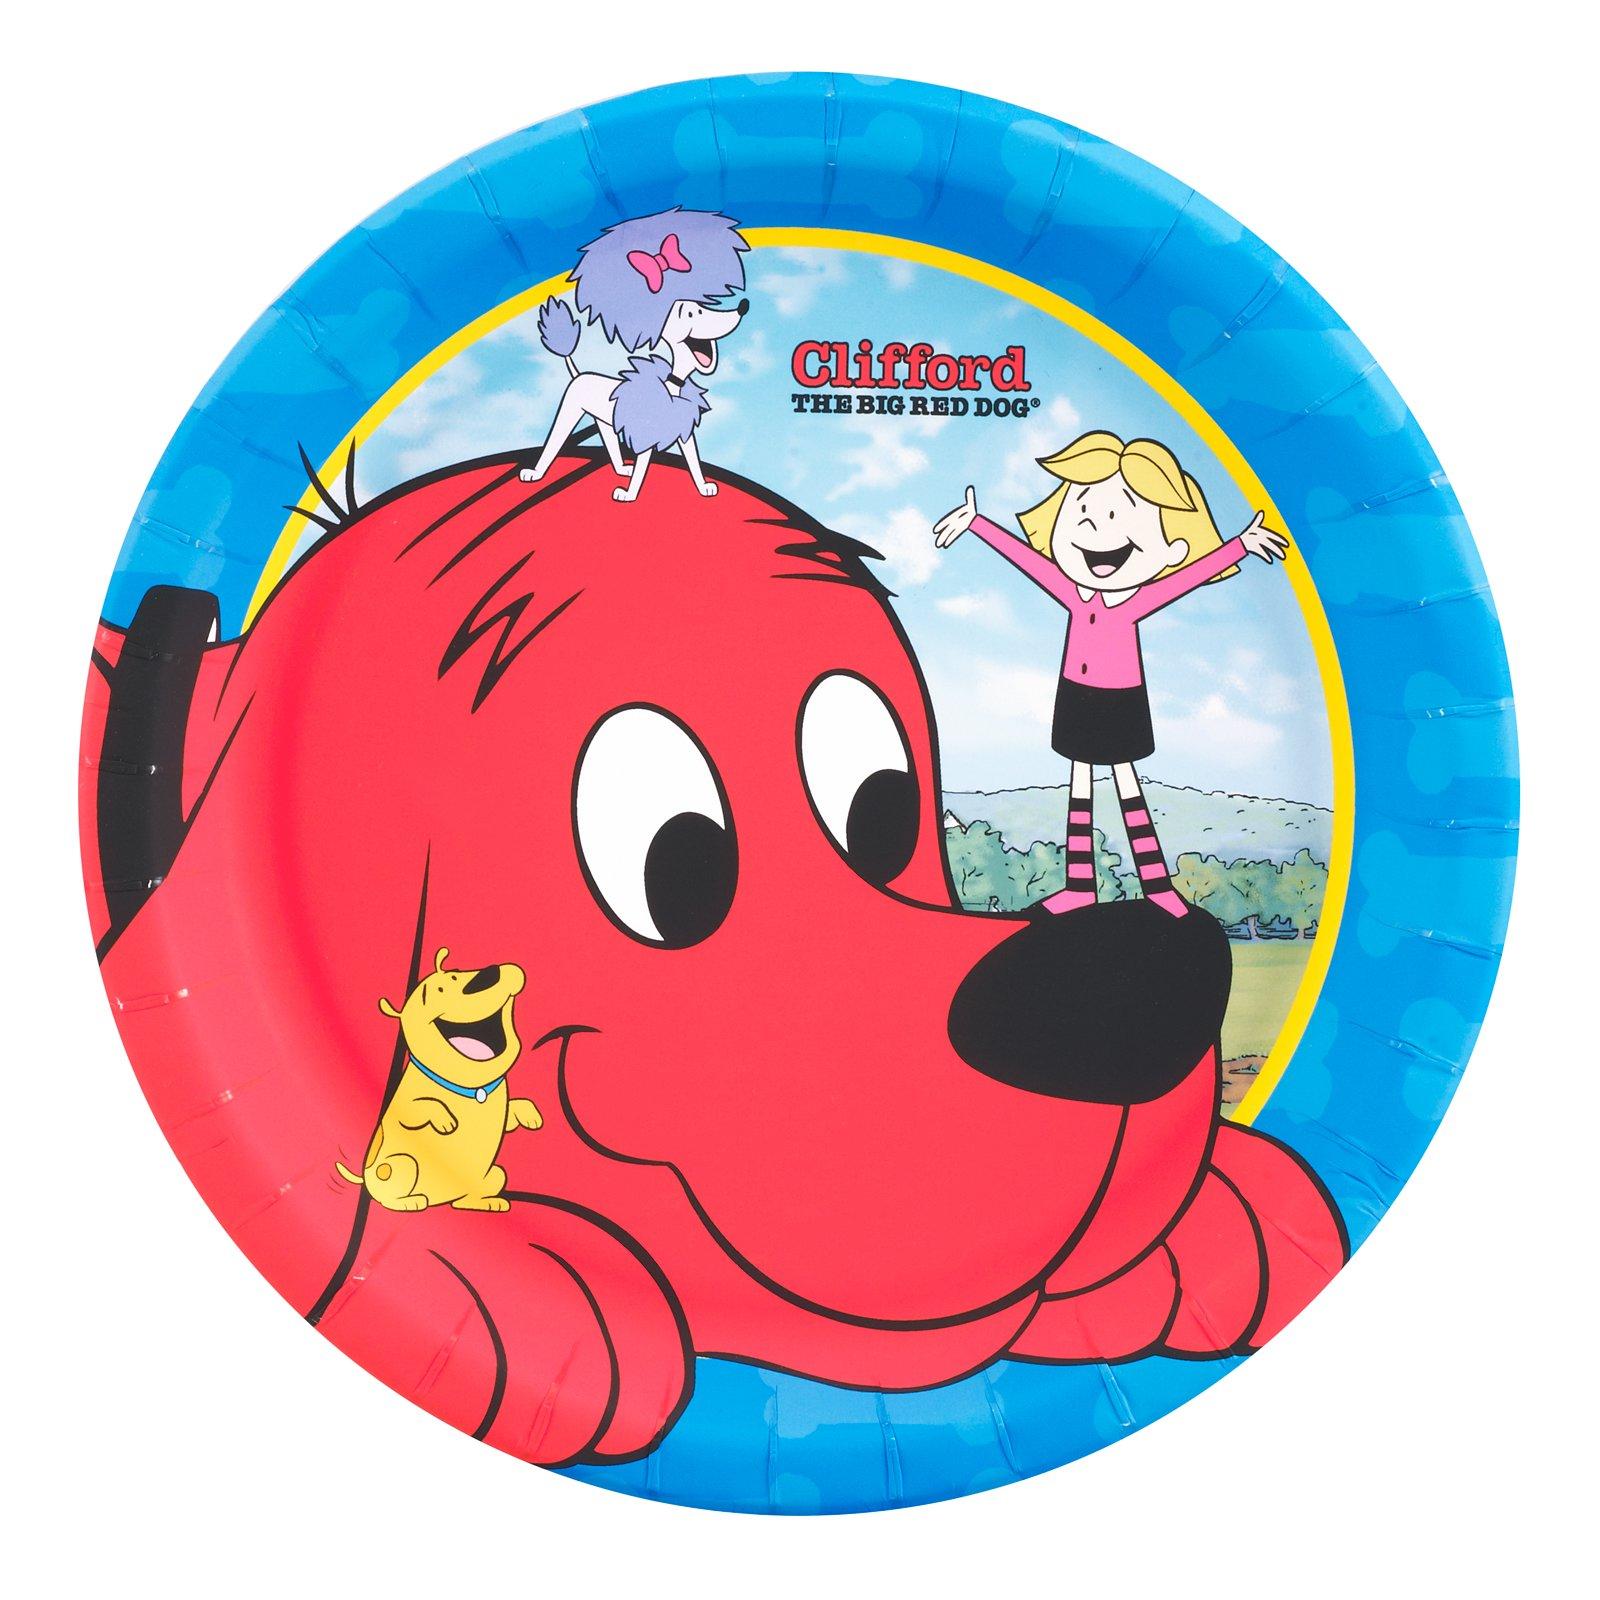 Birthdayexpress Brings Clifford The Big Red Dog R To